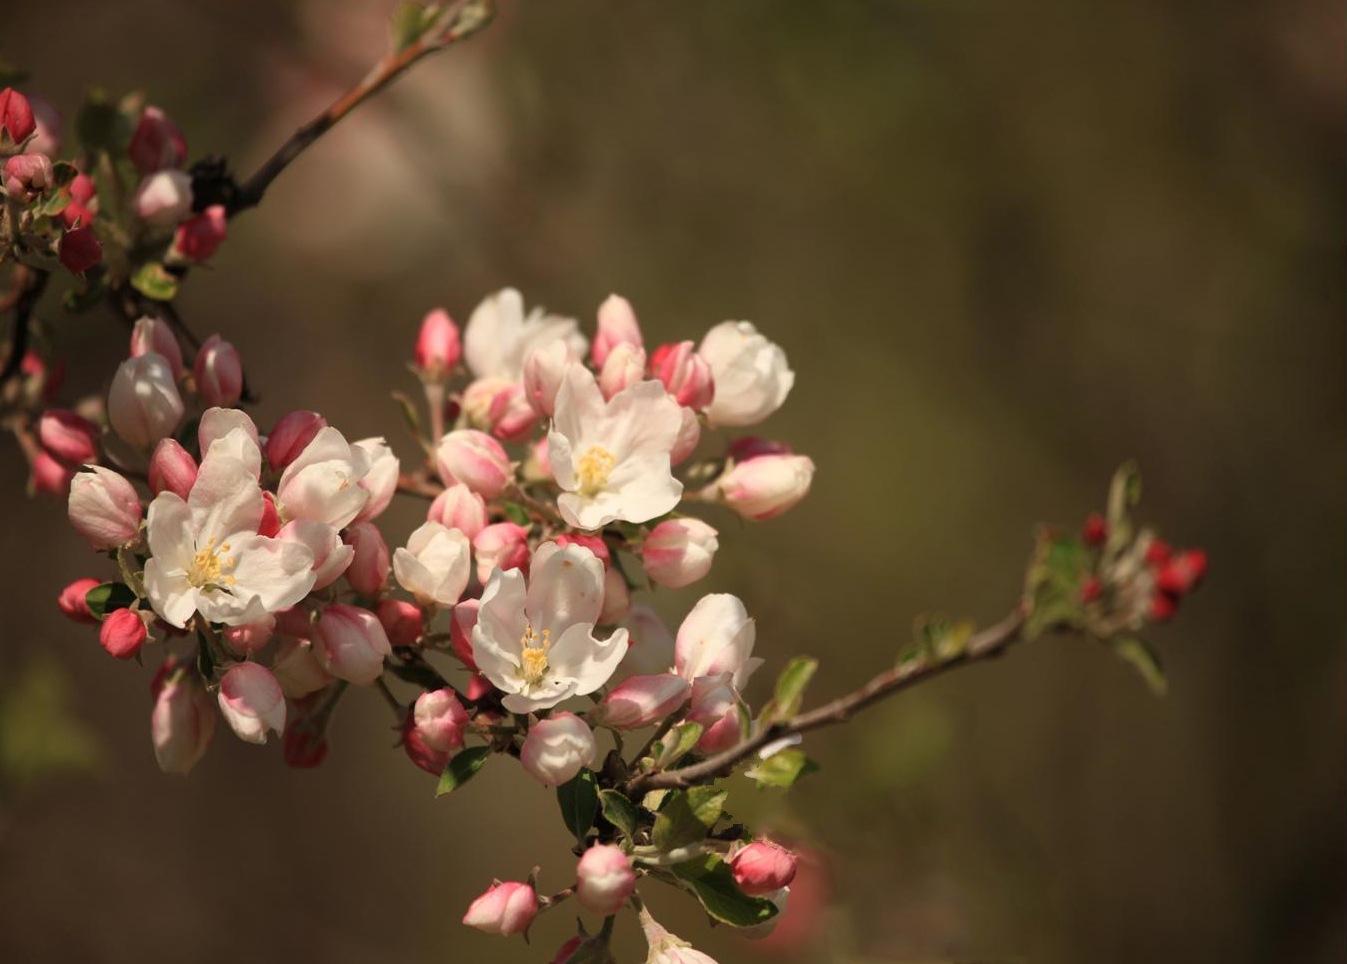 Spring Blossoms by Anna McShane